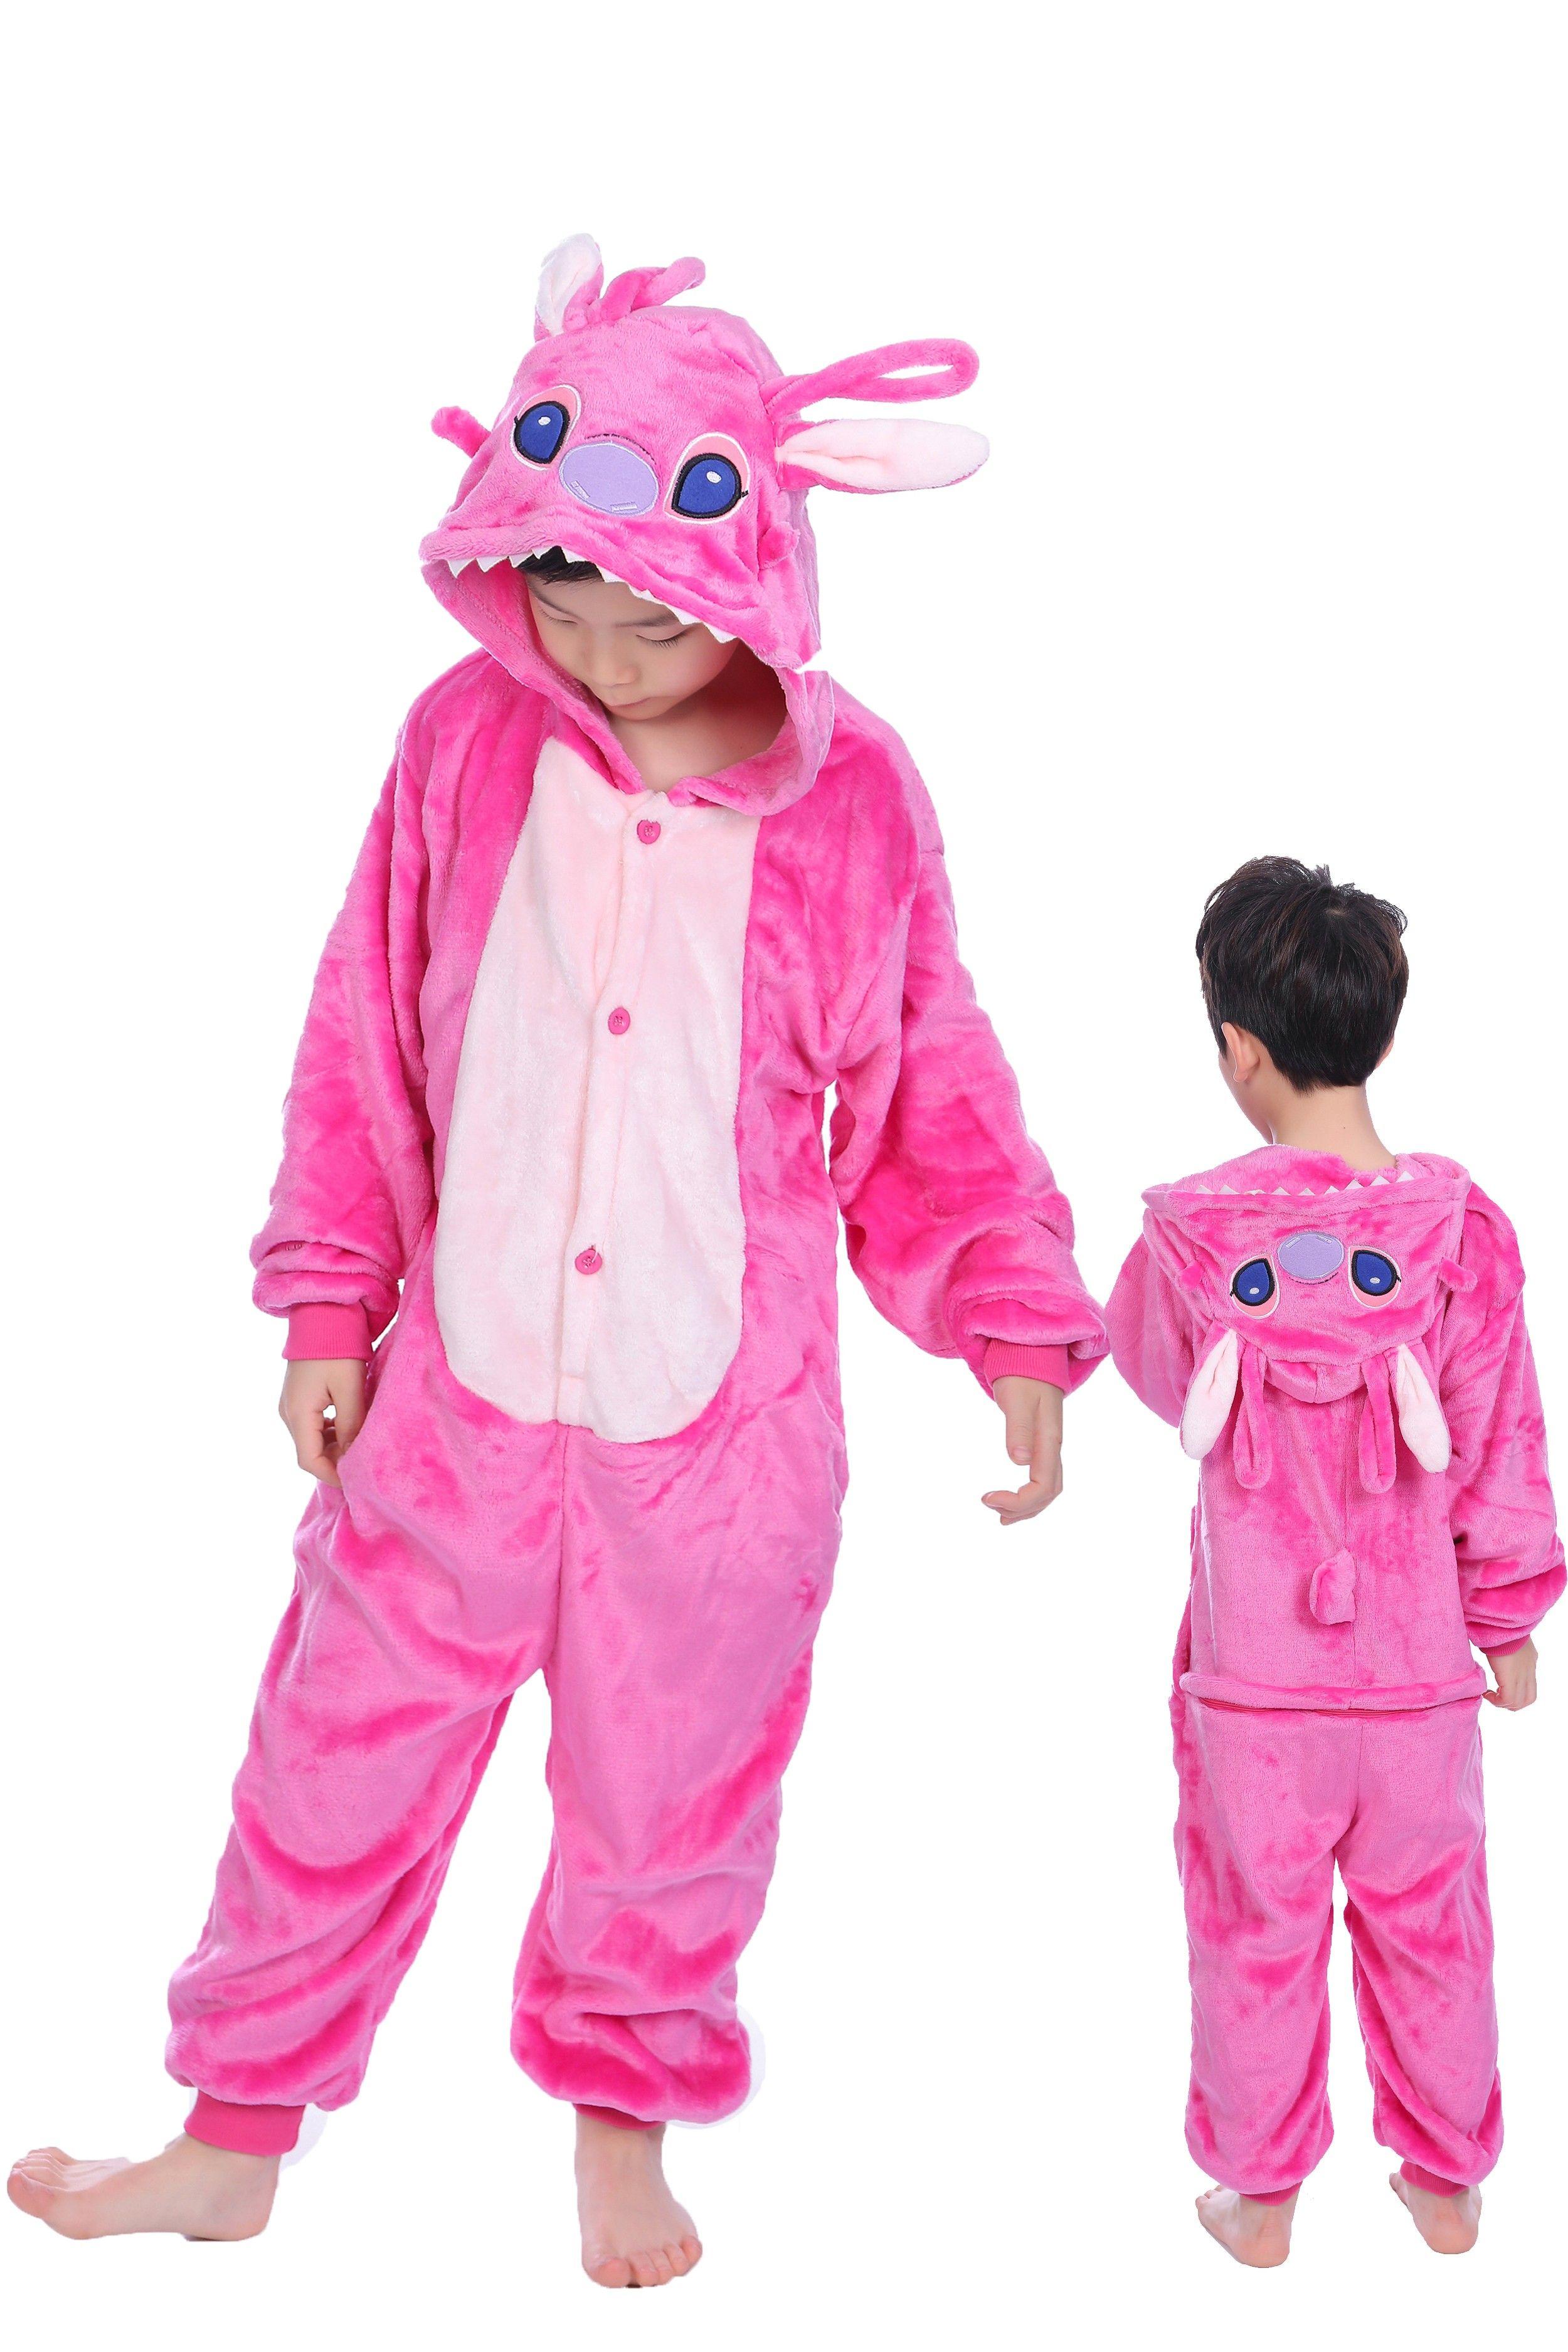 Kids Unicorn Kigurumi Animal Cosplay Costume Pajamas Sleepwear Halloween 3T